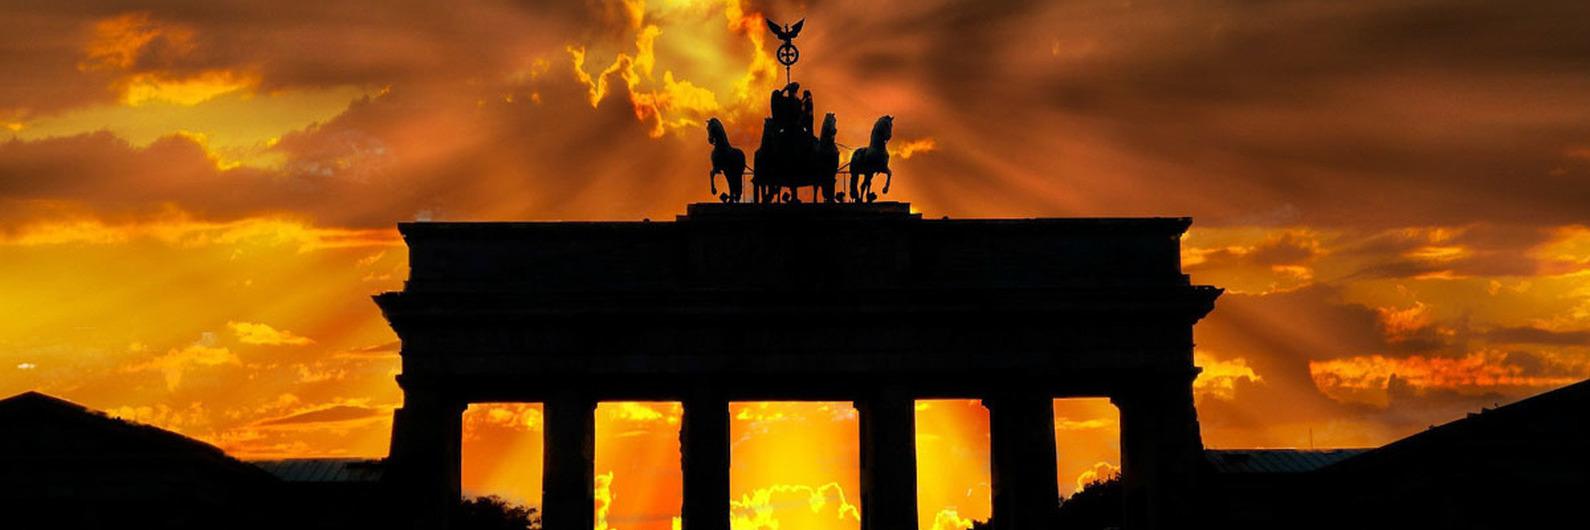 Berlim: a inabalável capital alemã